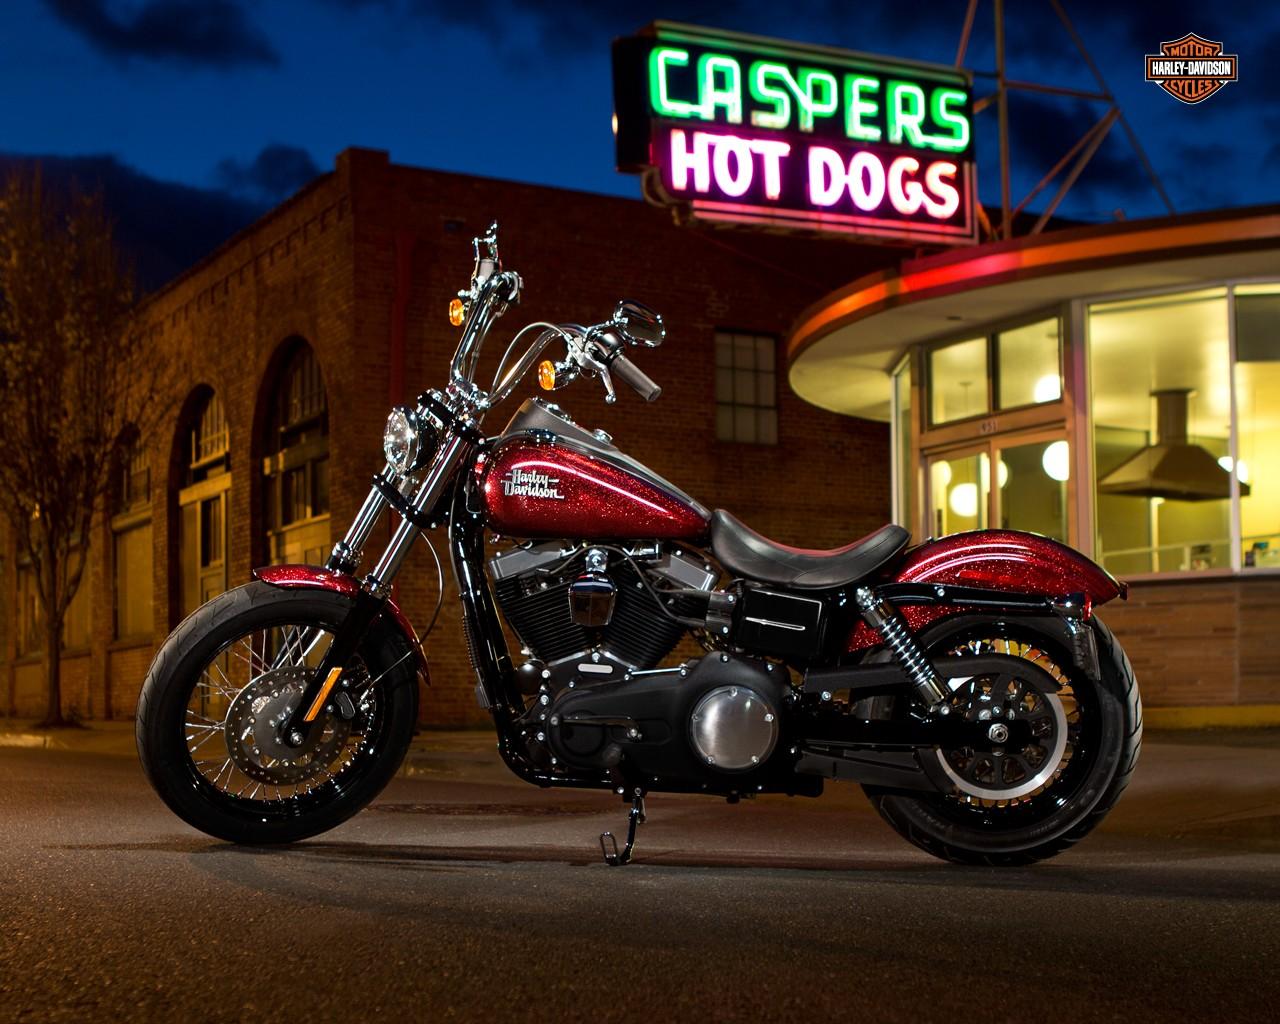 Harley Davidson Wallpapers And Screensavers: Street Glide Wallpapers And Screensavers